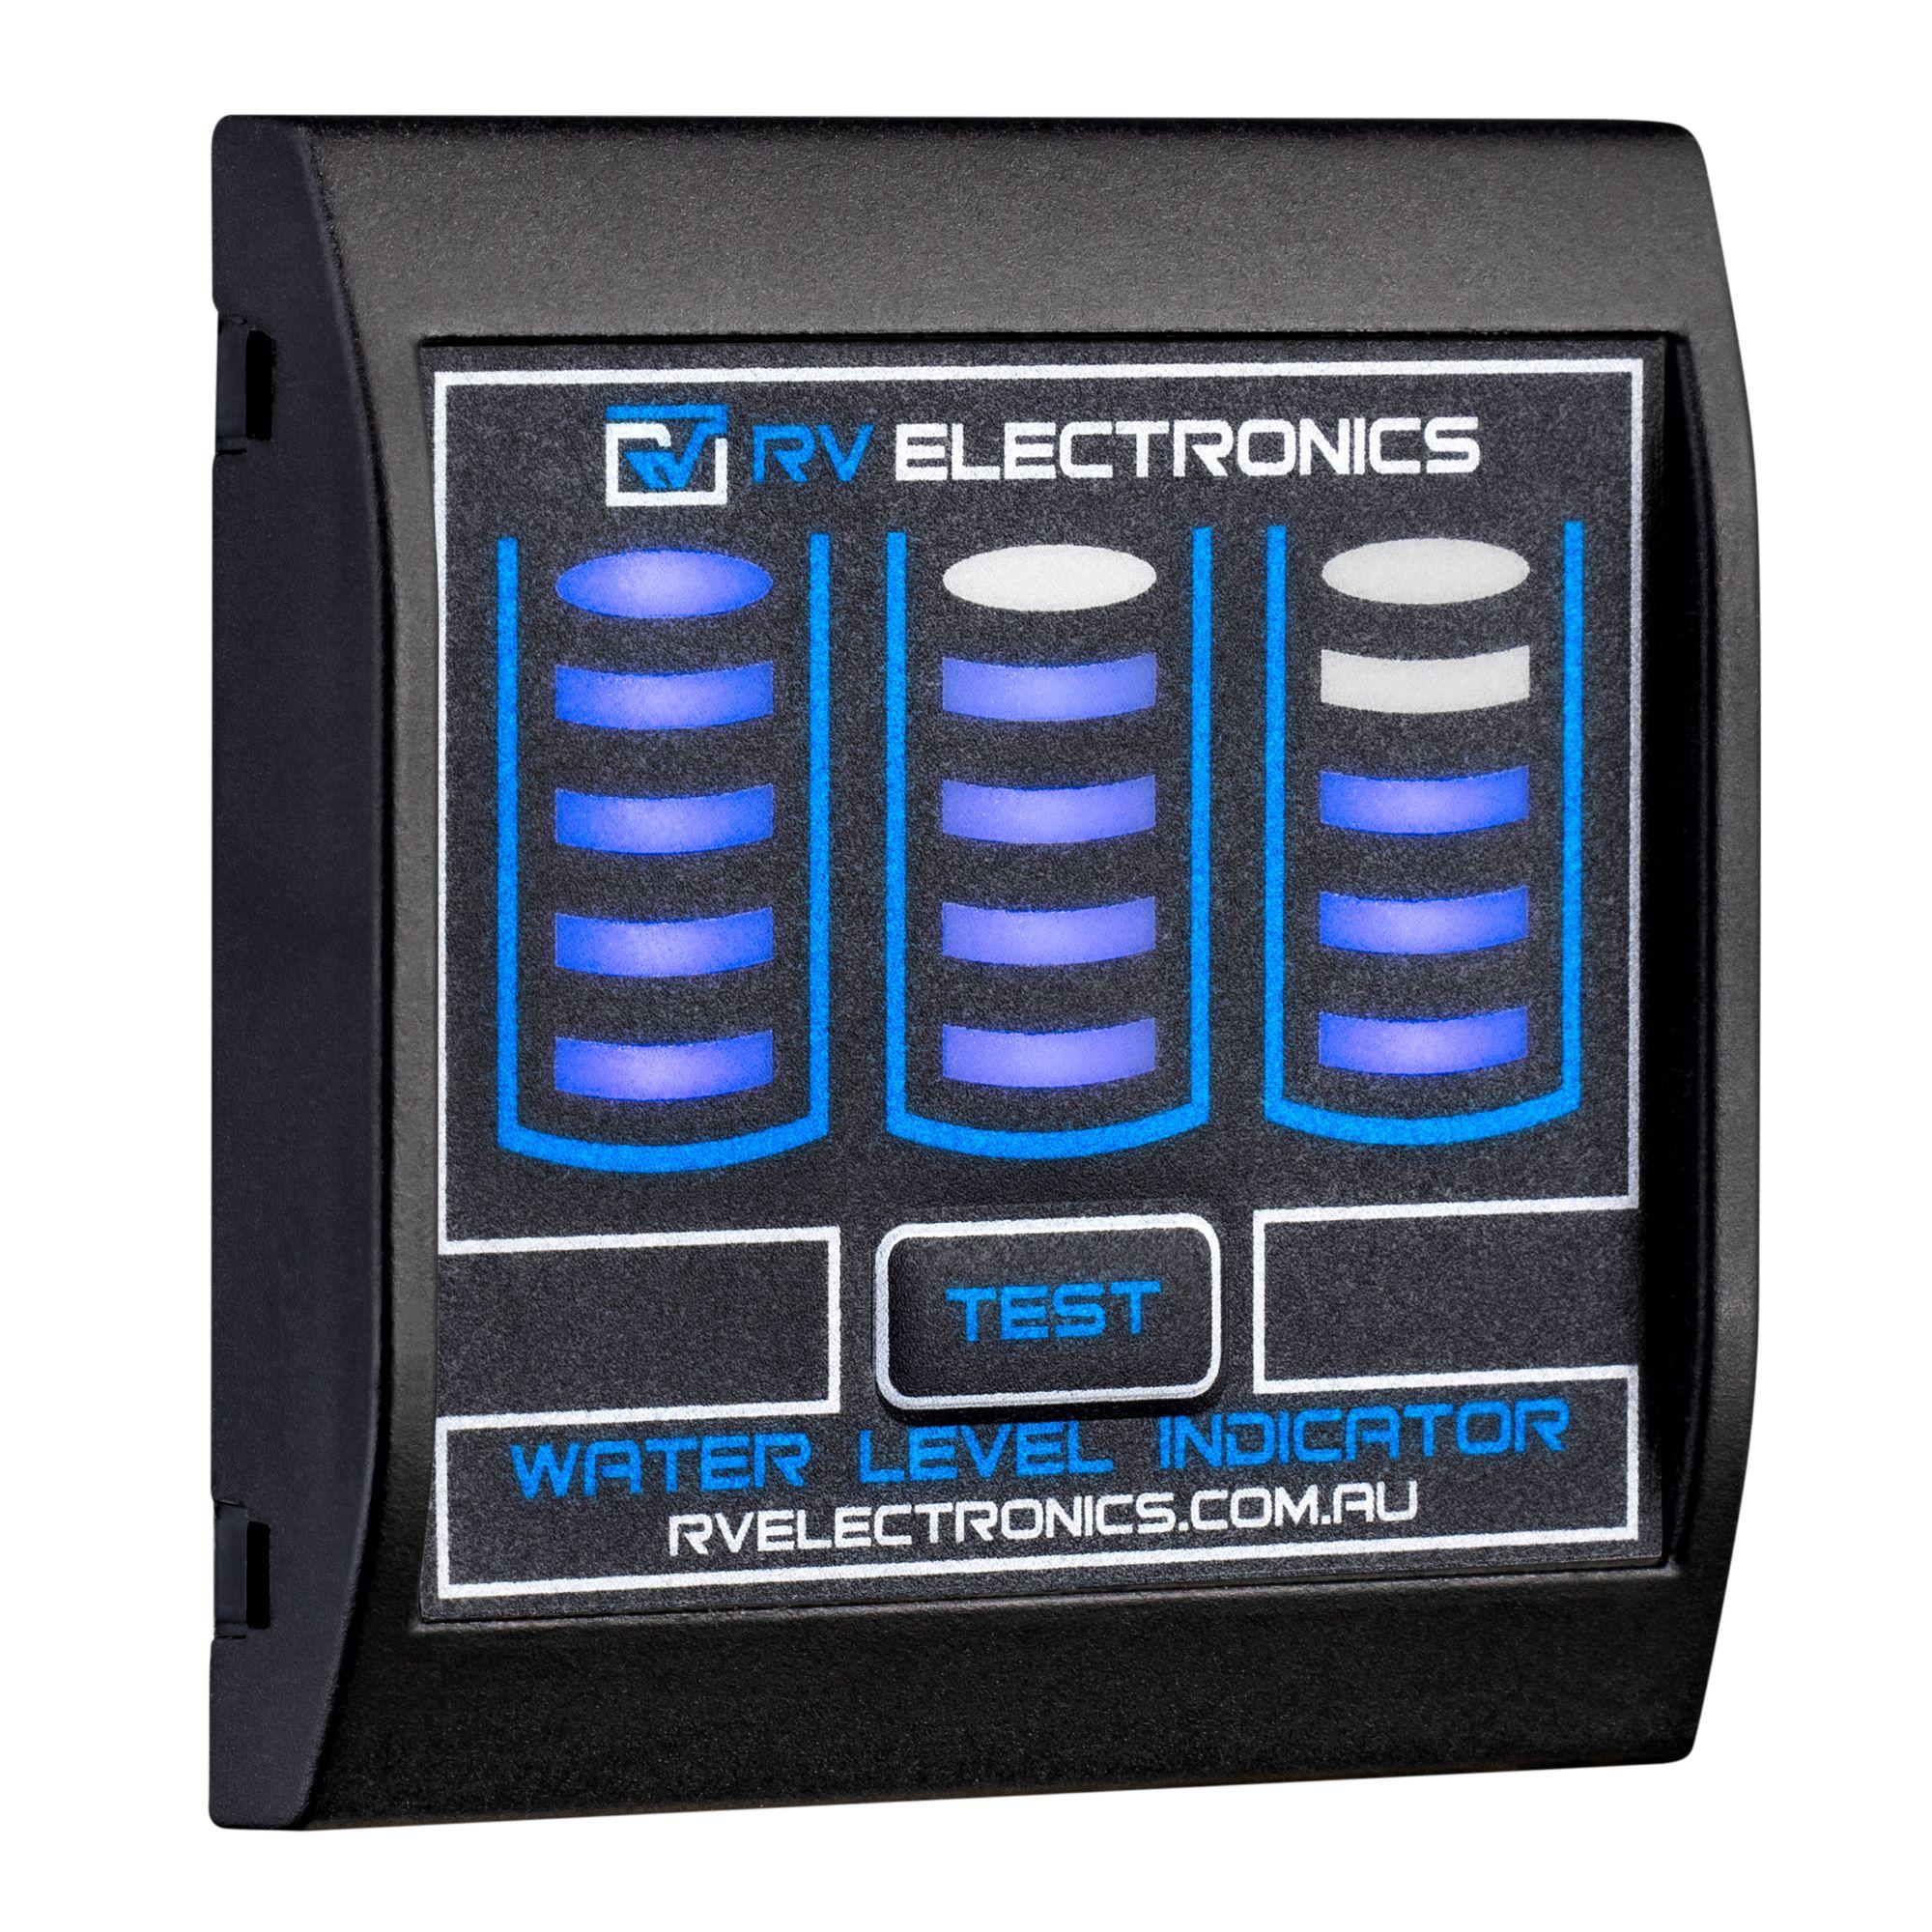 Slimline LED Black Triple Tank Water Level Indicator